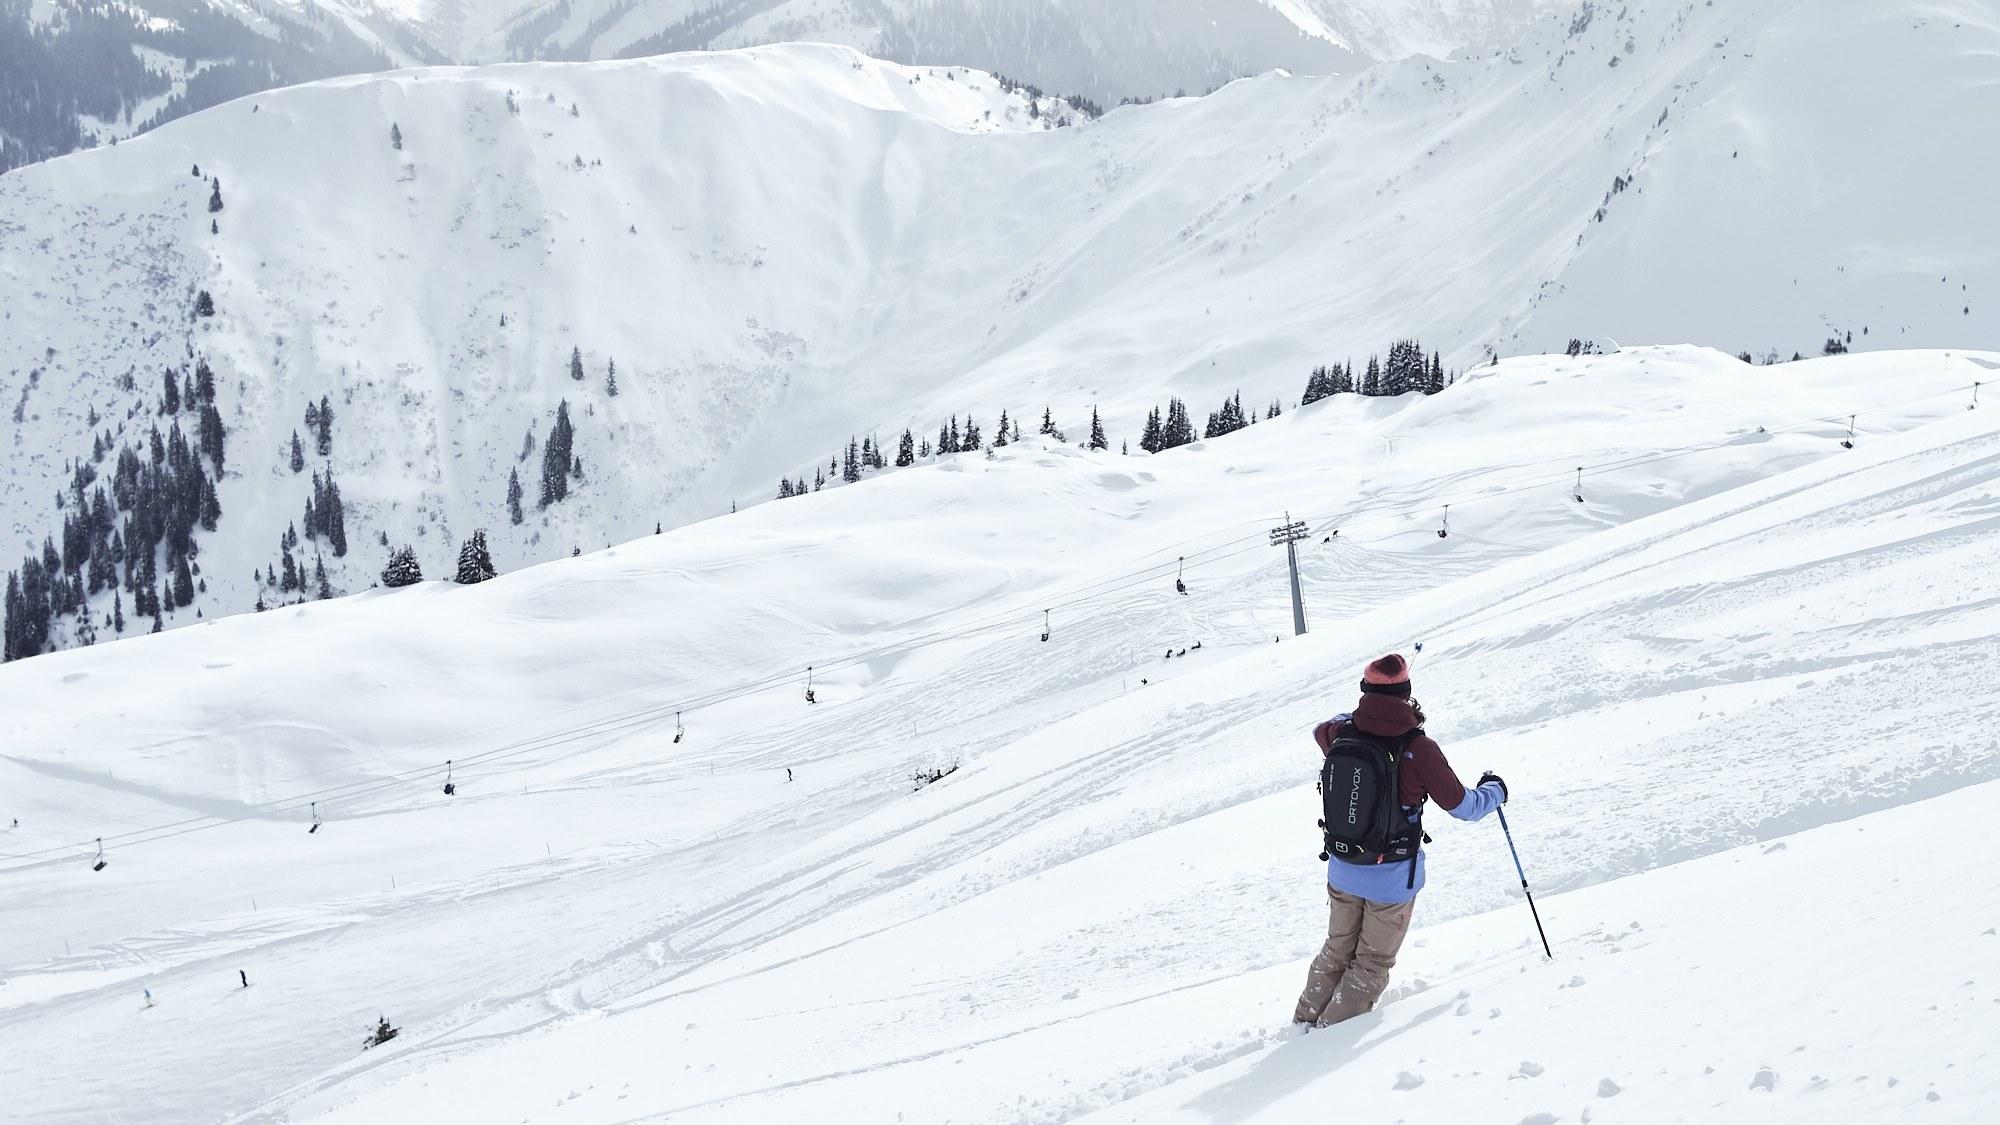 Guiding; Ski Academy Andermatt; Discover Disentis; Powder; off-piste; SkiArena Andermatt-Sedrun-Disentis; best ski school;